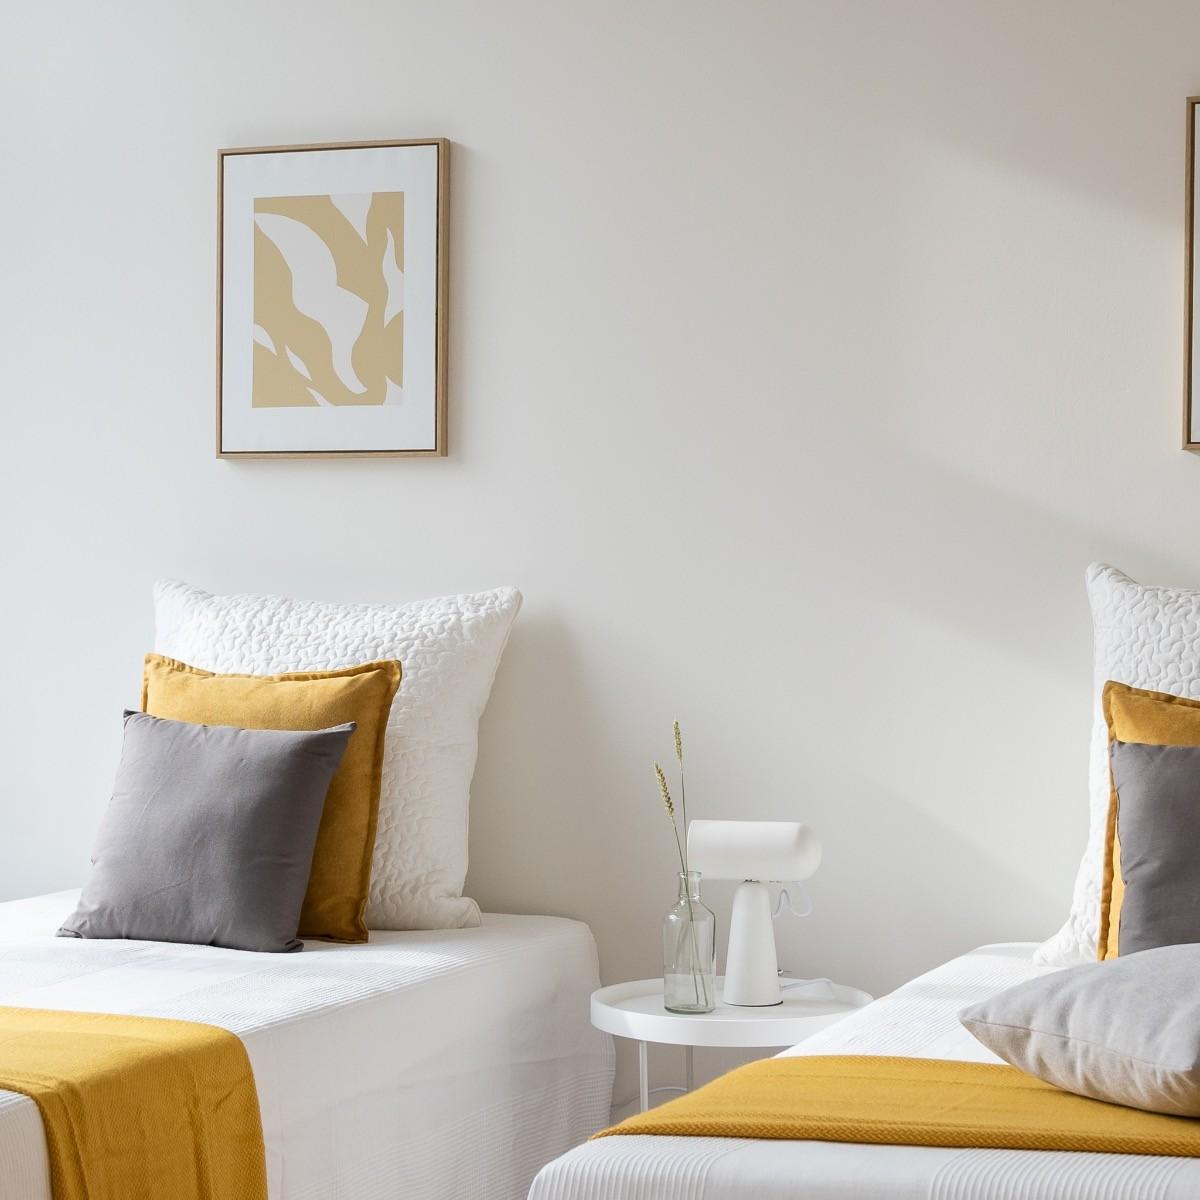 Cubiqz 4 Home beds